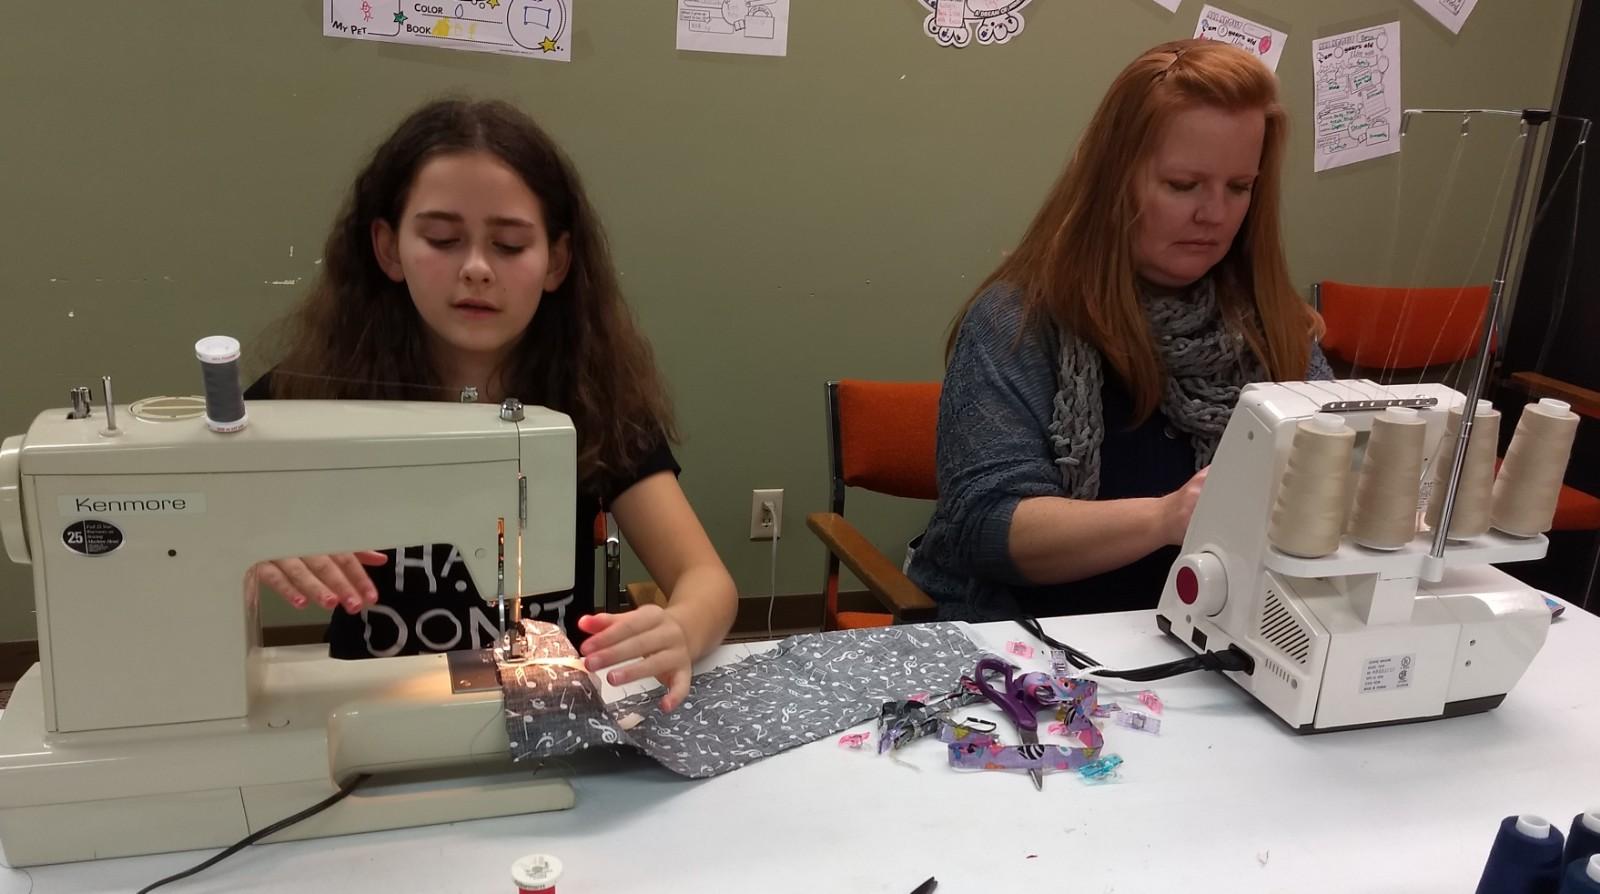 Sewing Machine Mavin